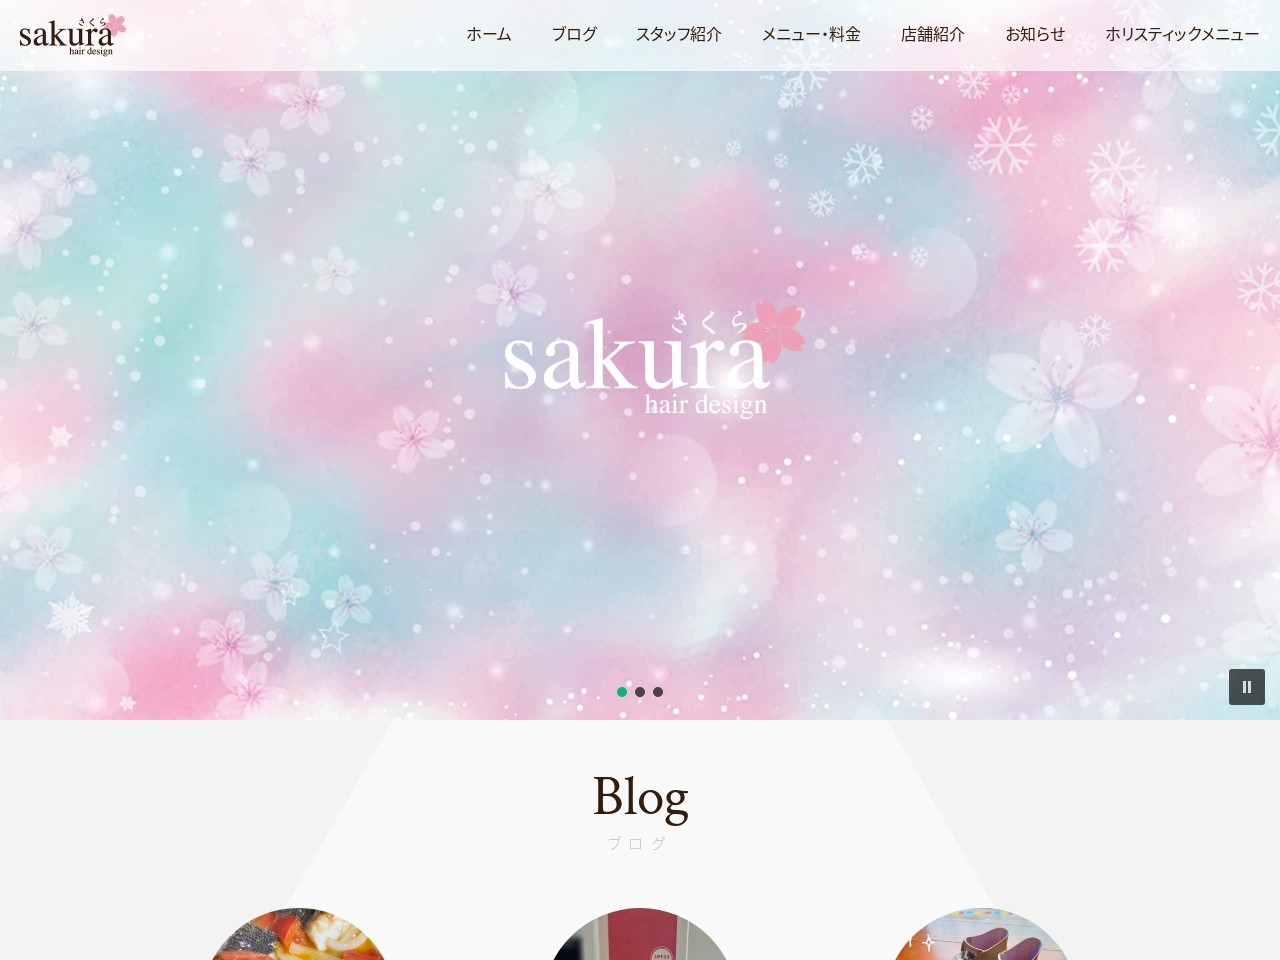 sakura hair design (サクラ ヘア デザイン)